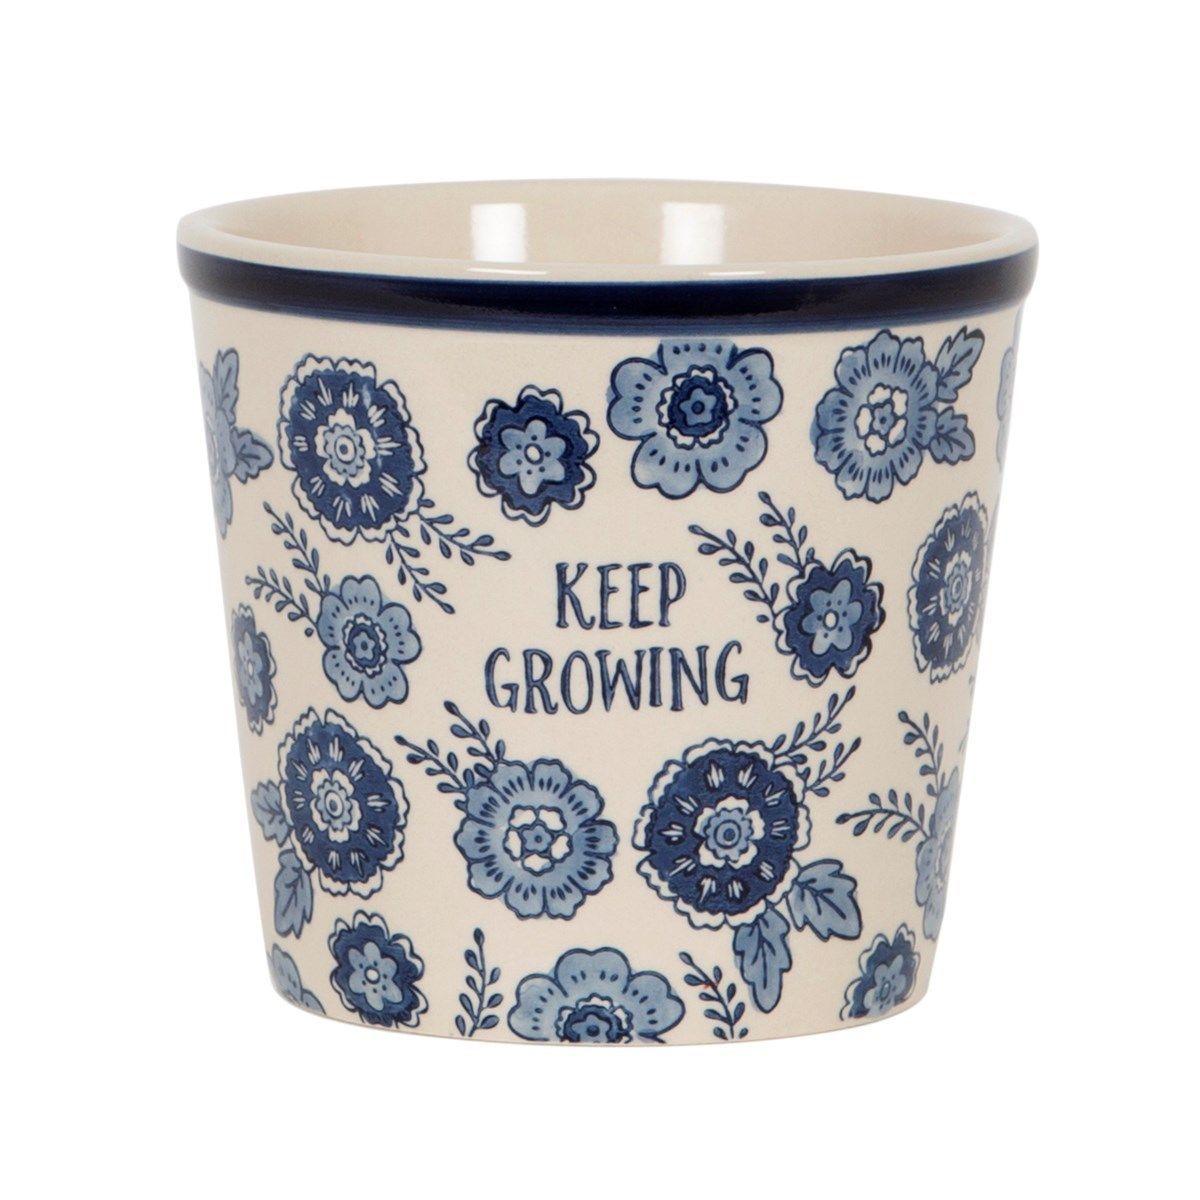 Keep Growing Planter (Blue Floral) image